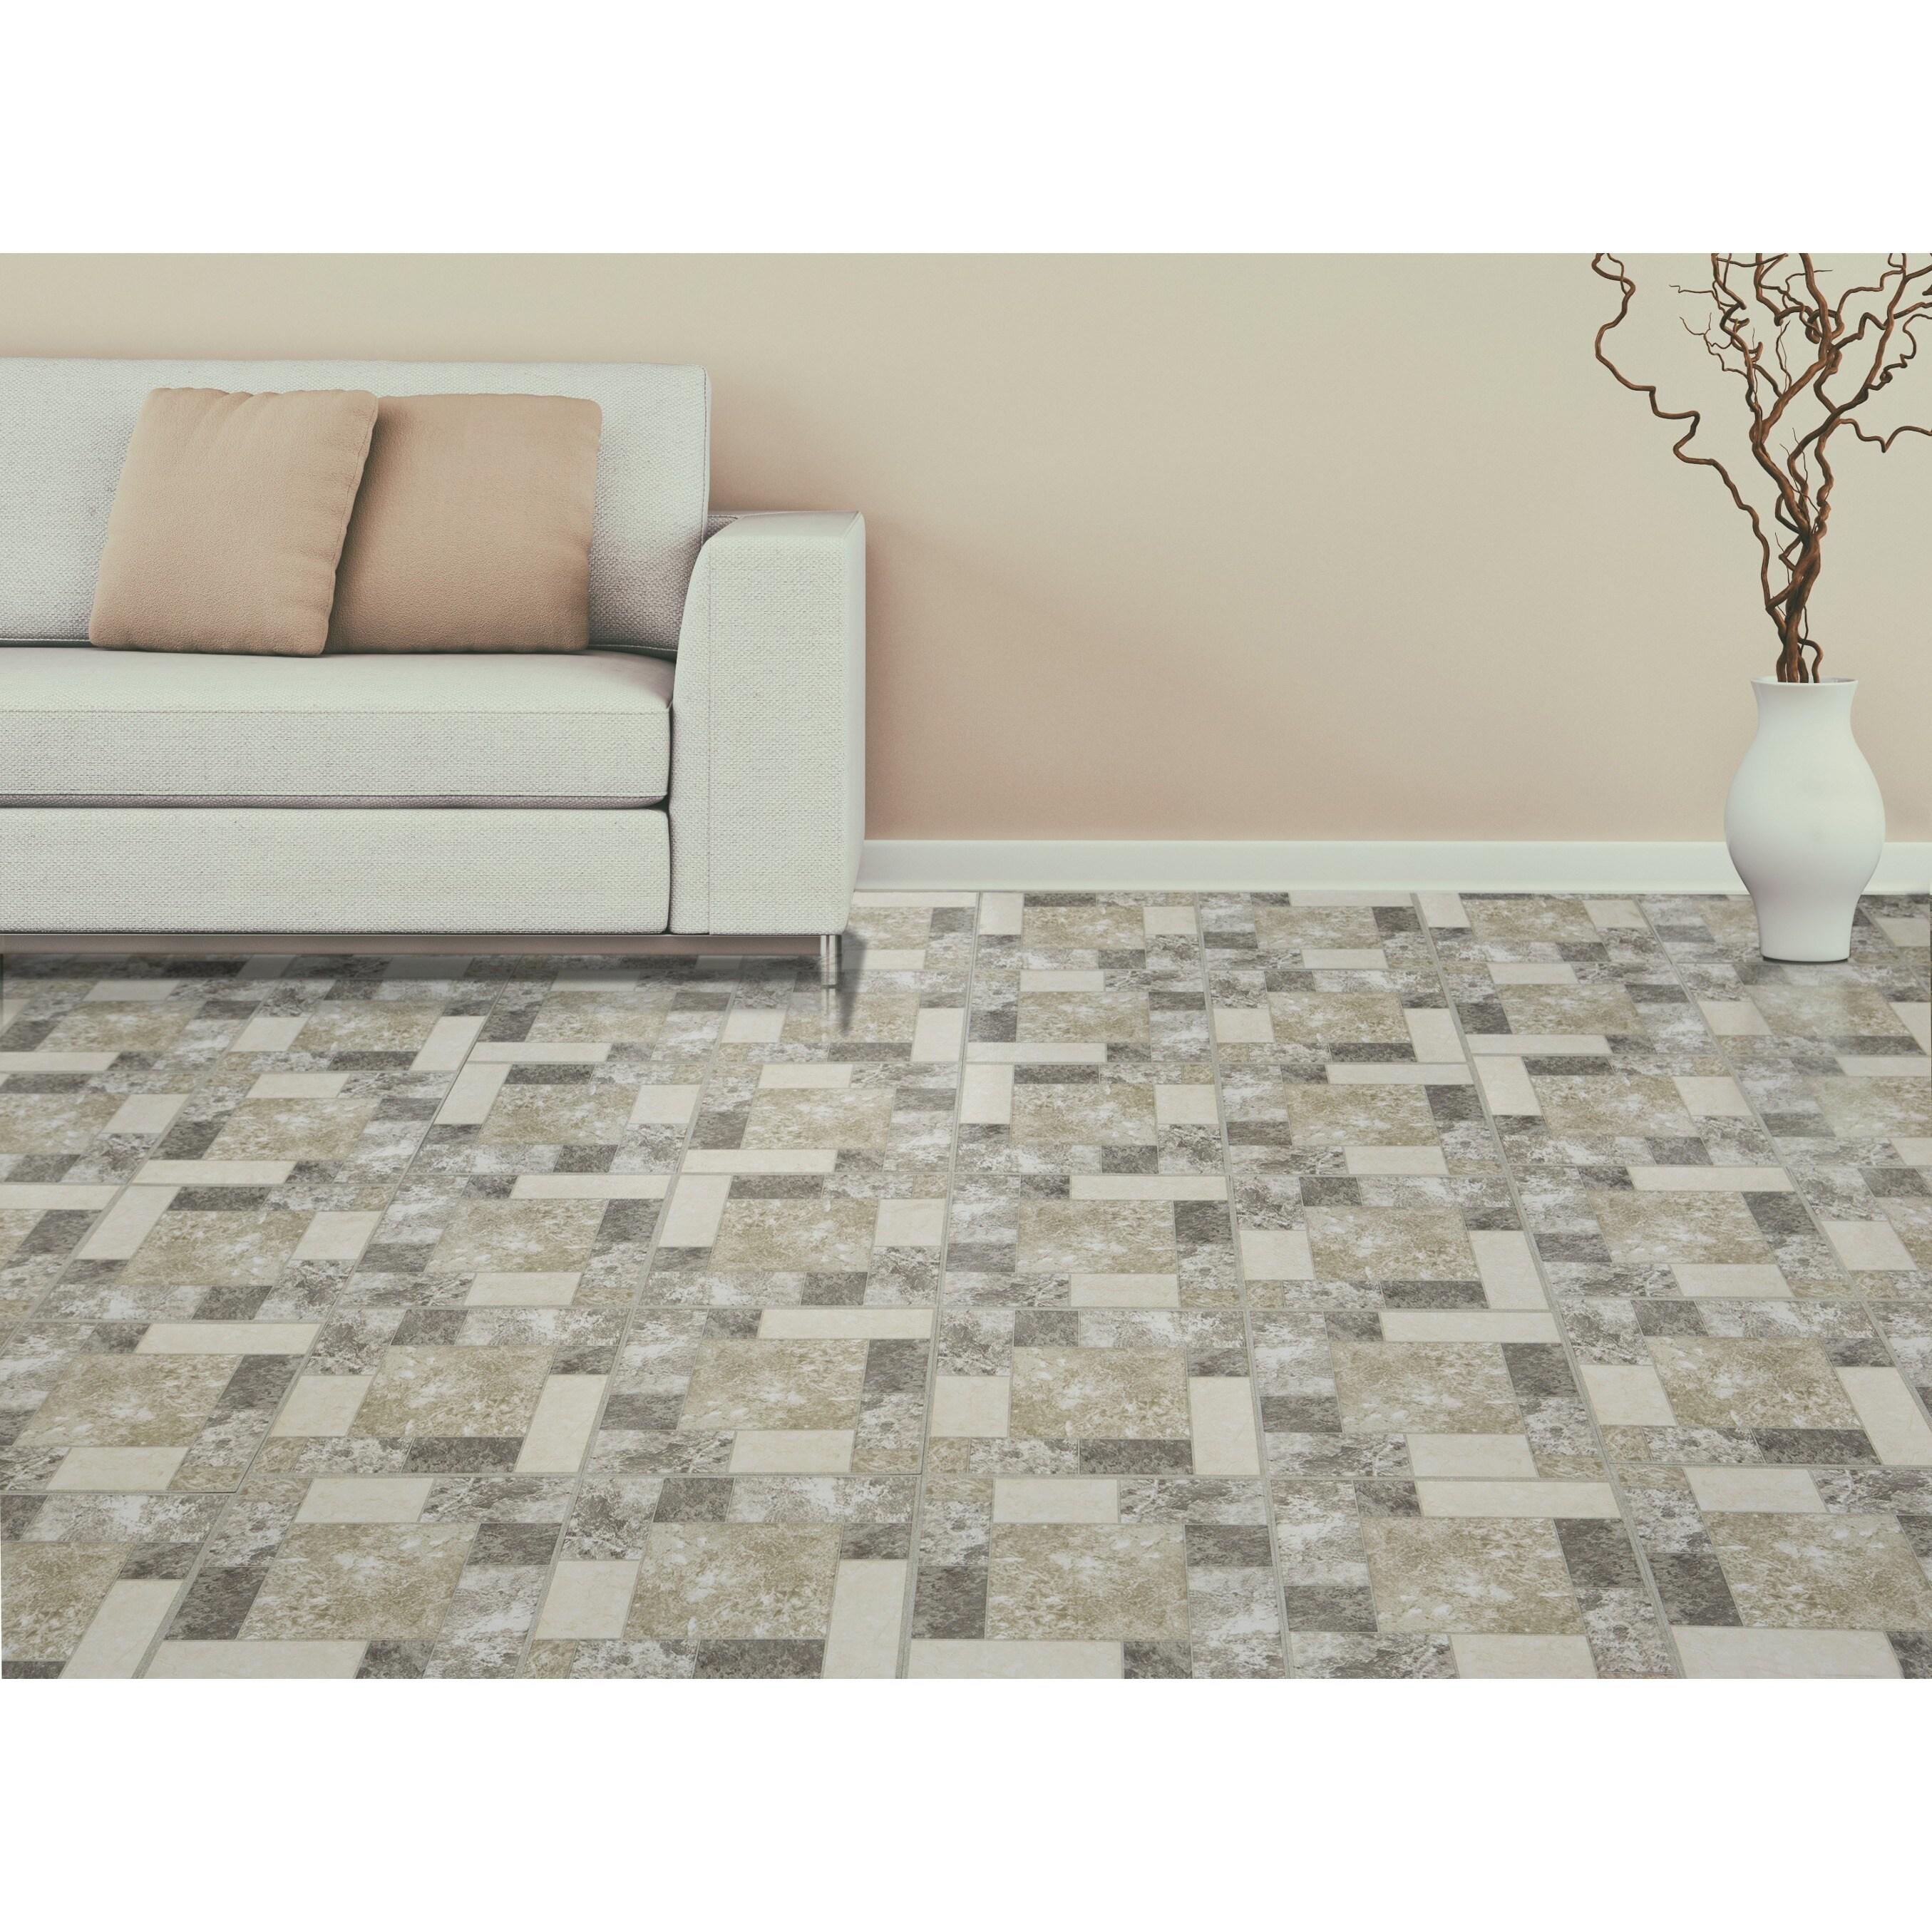 Achim nexus marble blocks 12x12 self adhesive vinyl floor tile achim nexus marble blocks 12x12 self adhesive vinyl floor tile 20 tiles20 sq ft free shipping on orders over 45 overstock 15782635 dailygadgetfo Images